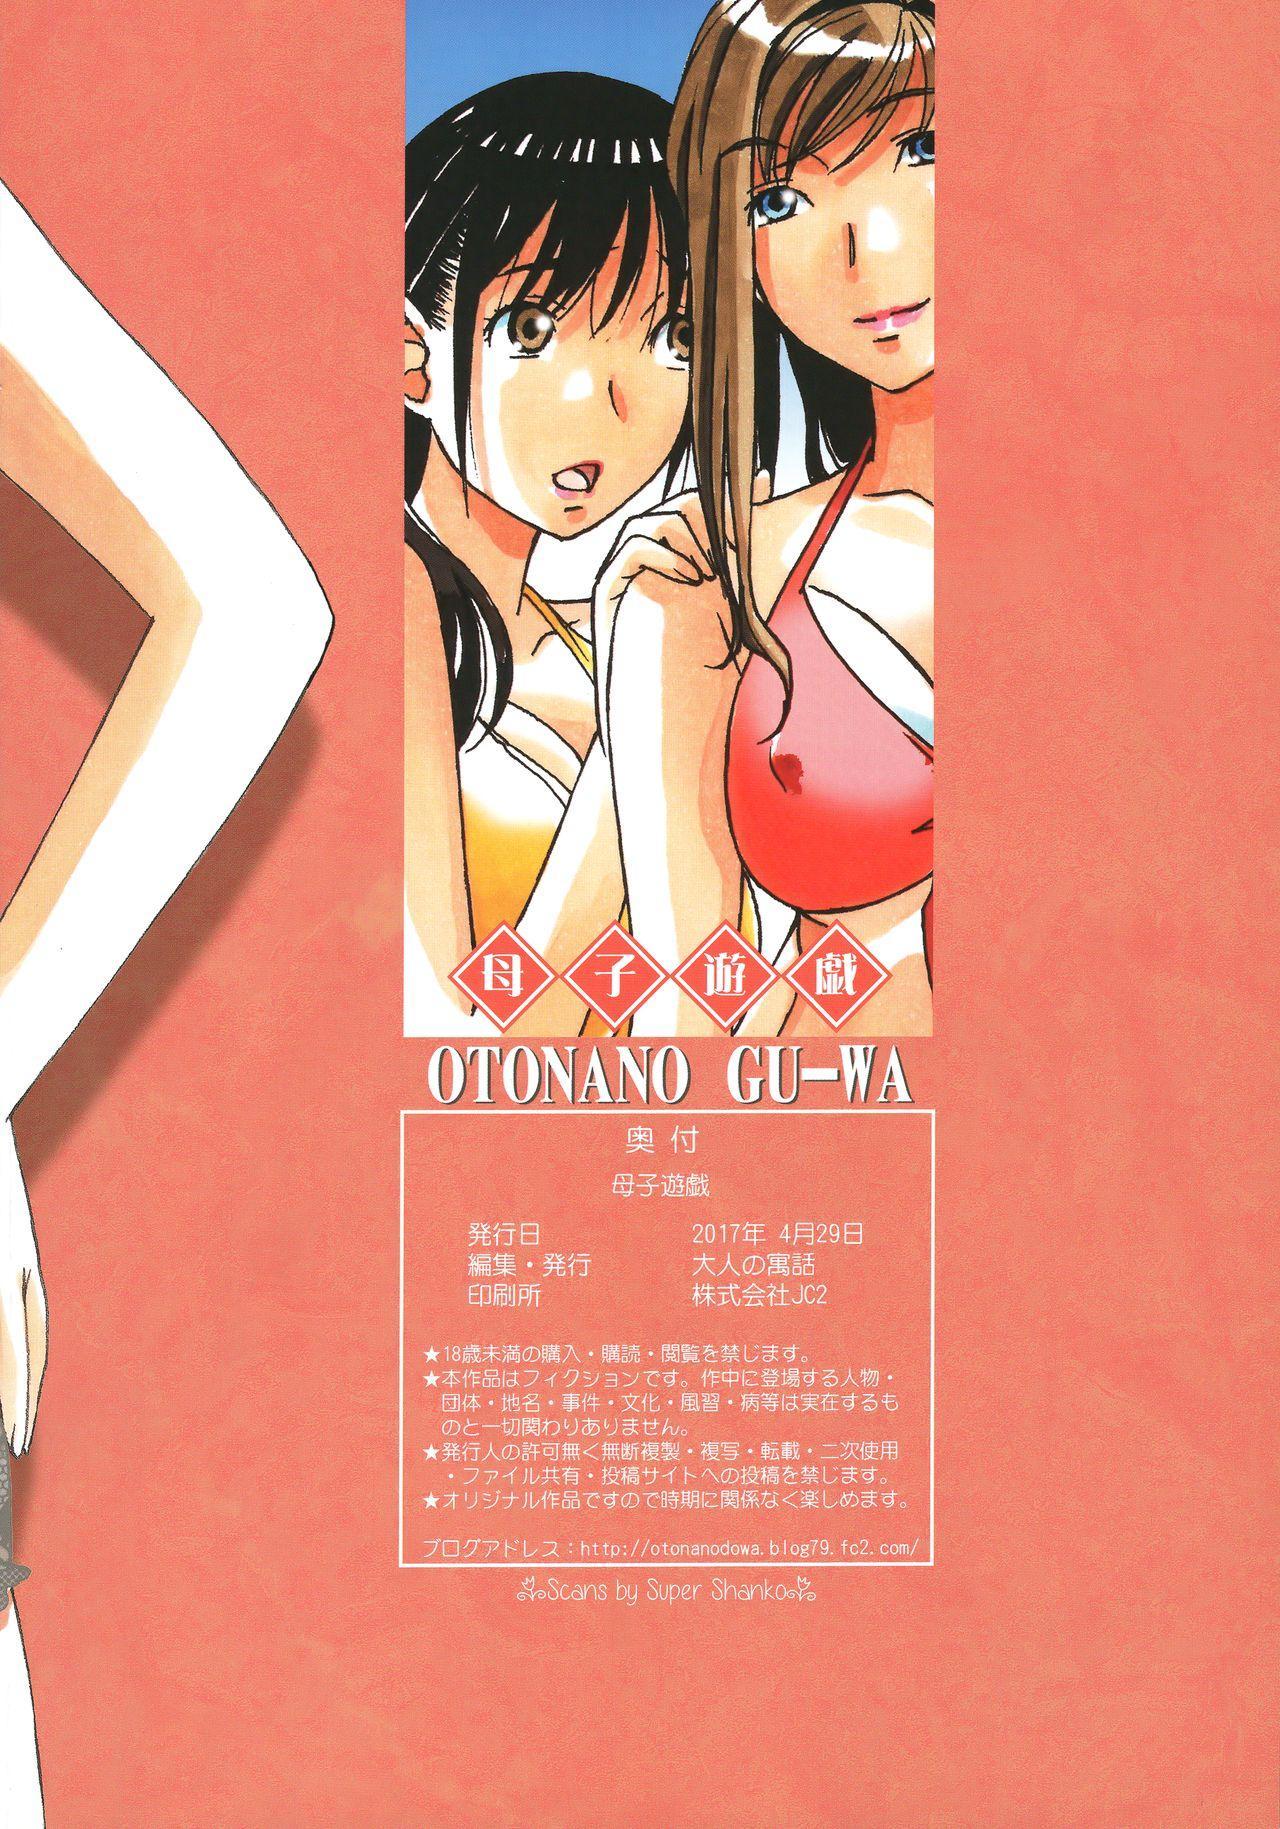 Boshi Yuugi Jou - Mother and Child Game 29